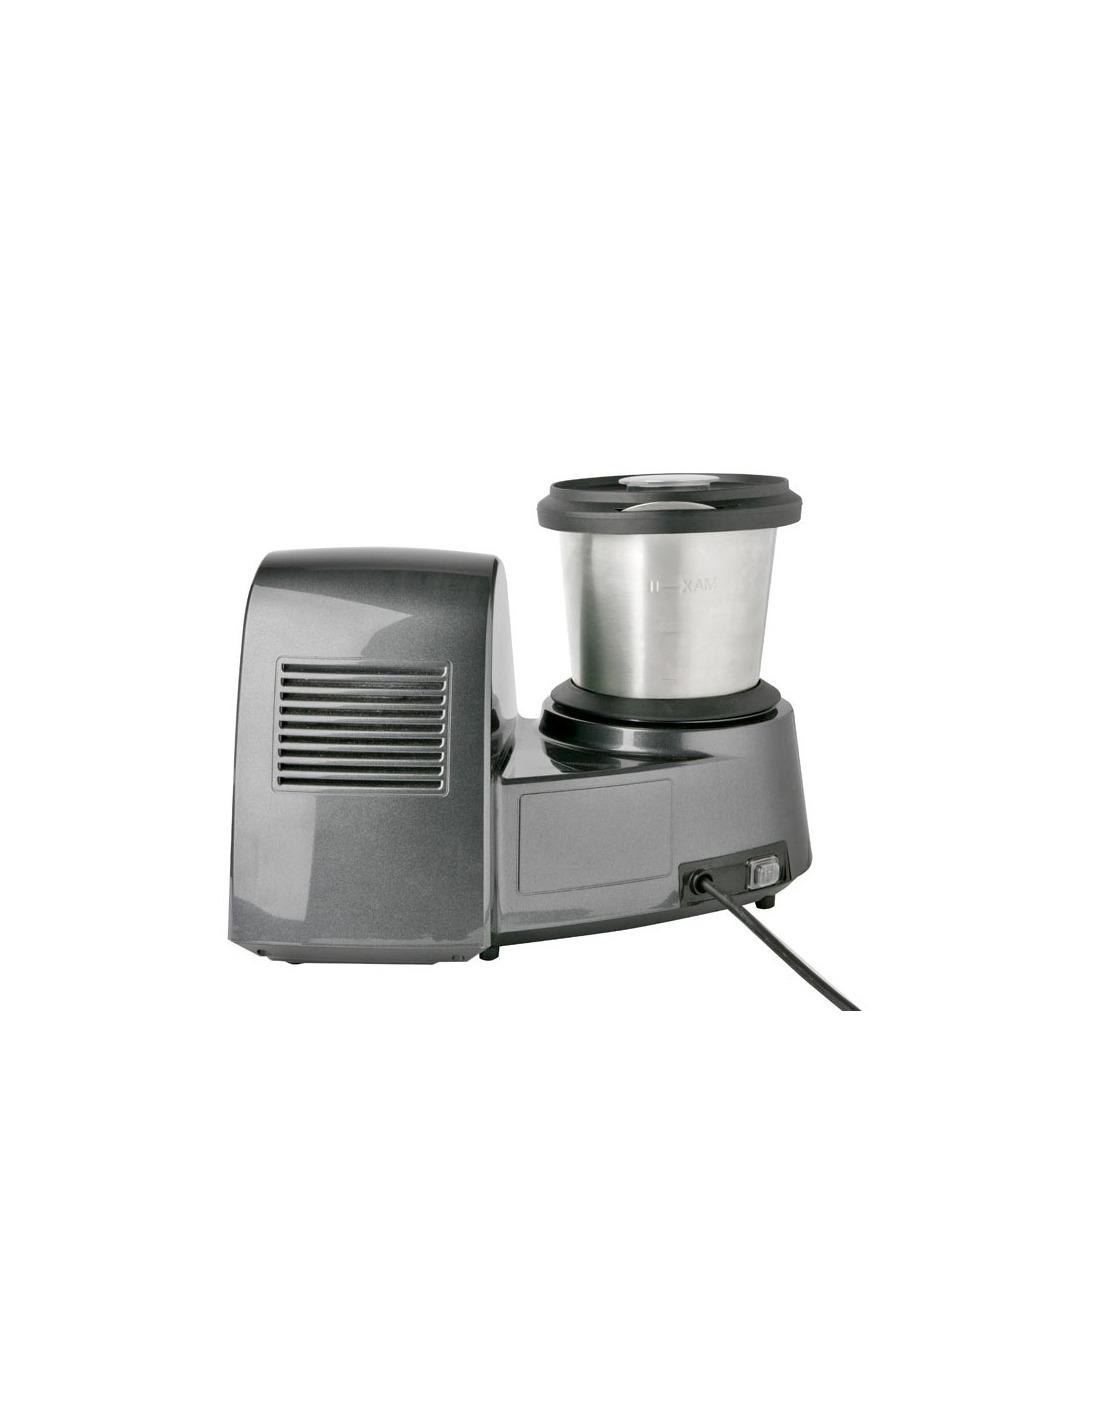 Robot de cocina mycook 1 8 de taurus la hostelera - Robot de cocina taurus mycook 59 precio ...